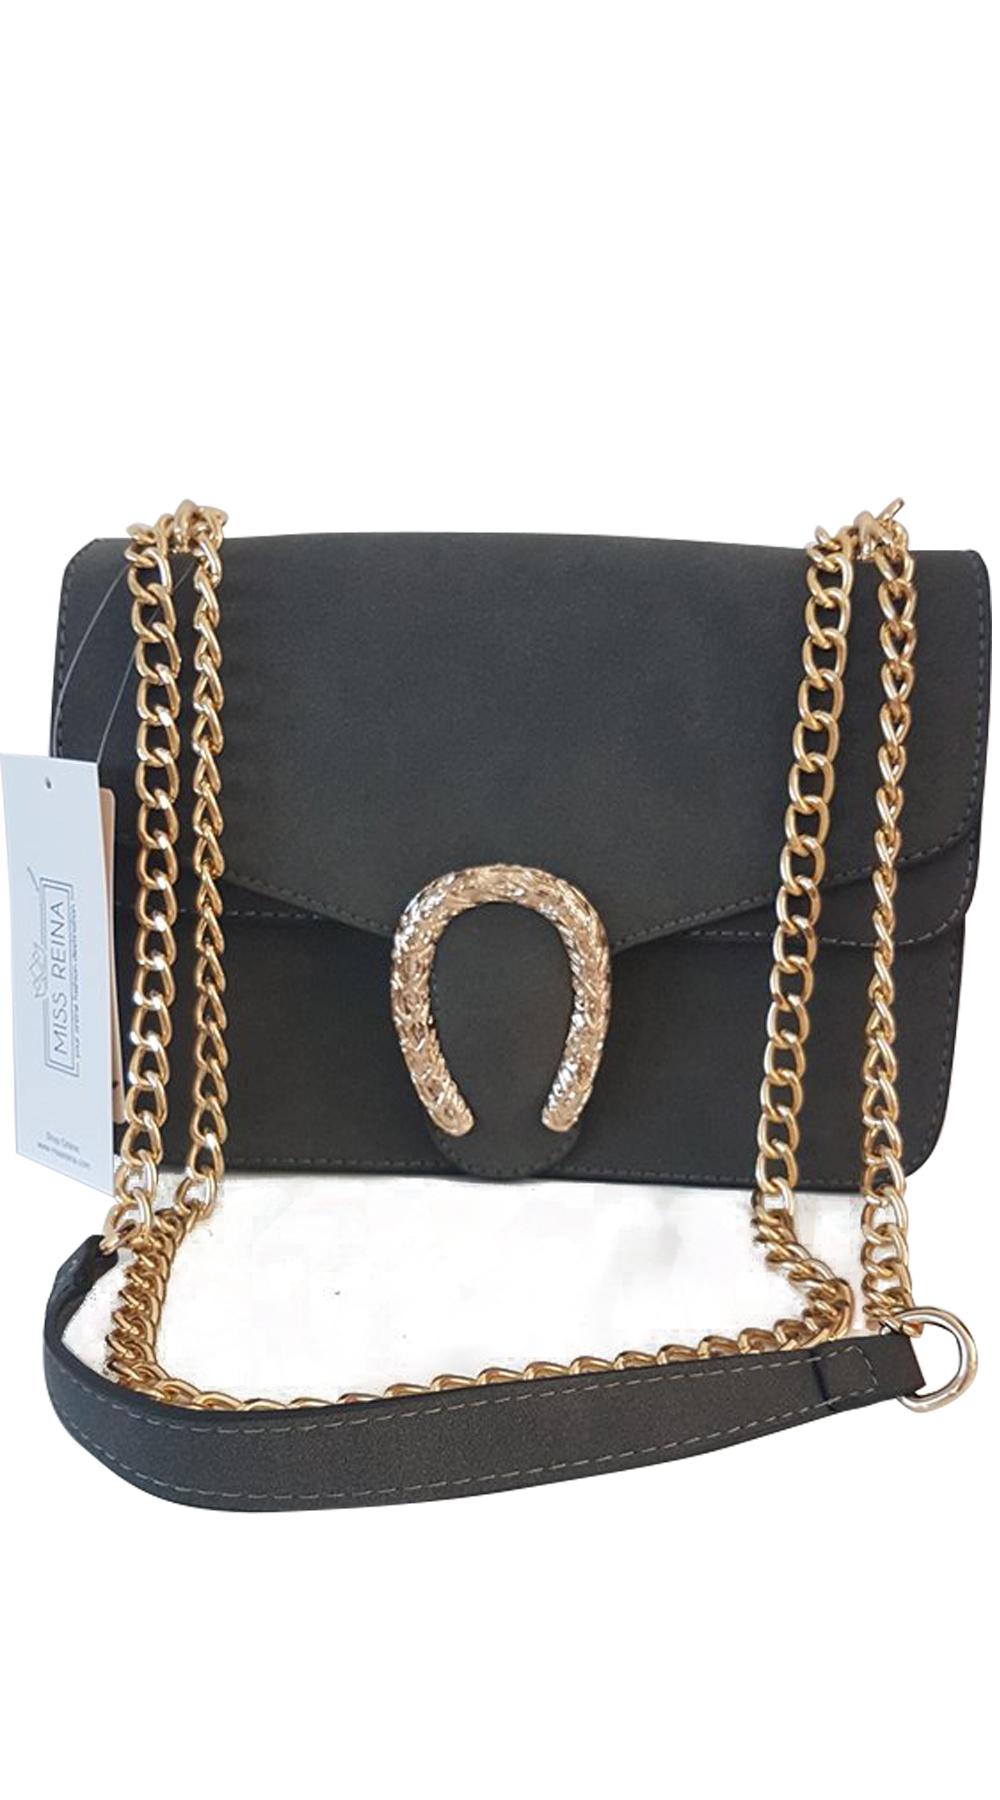 bb373f50e8 Γυναικεία τσάντα χιαστί leatherlook metallic snake buckle - OEM -  FA17AC-6881-1